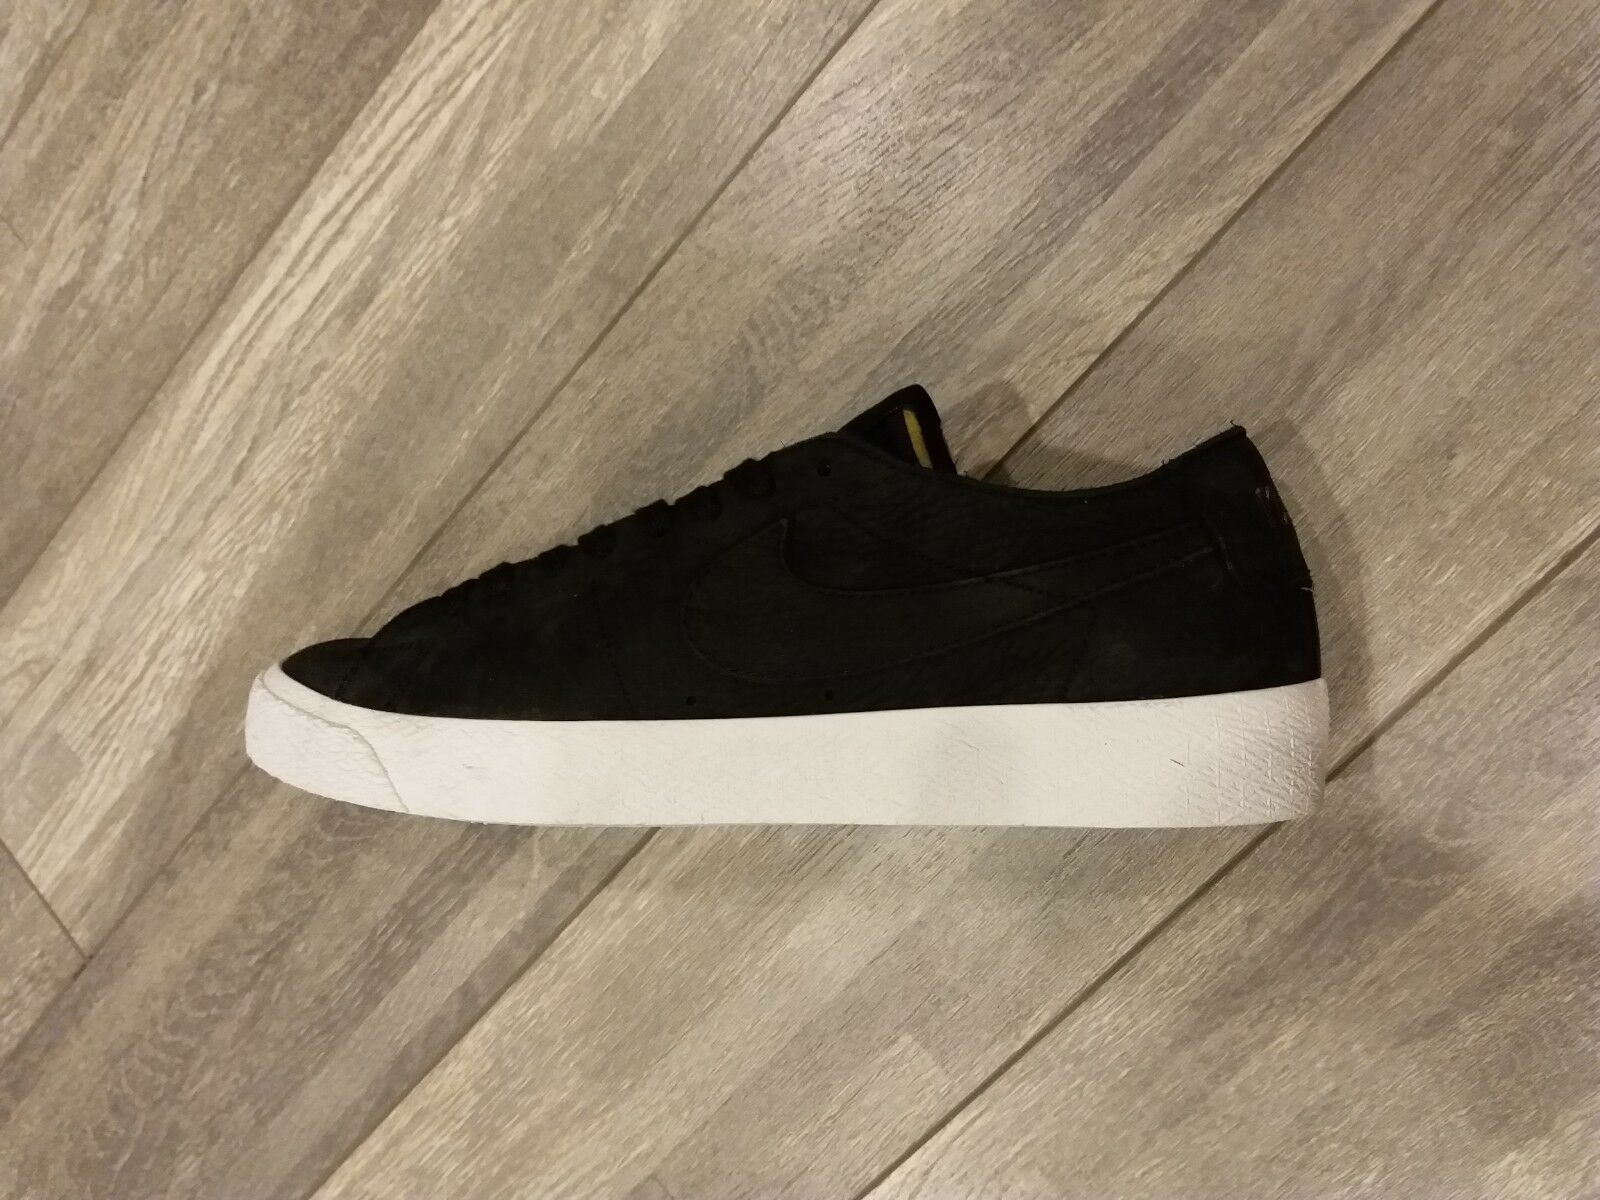 Nike SB Zoom Blazer Low Pro Decon Black Anthracite AA4274-002 Men's New Size 11